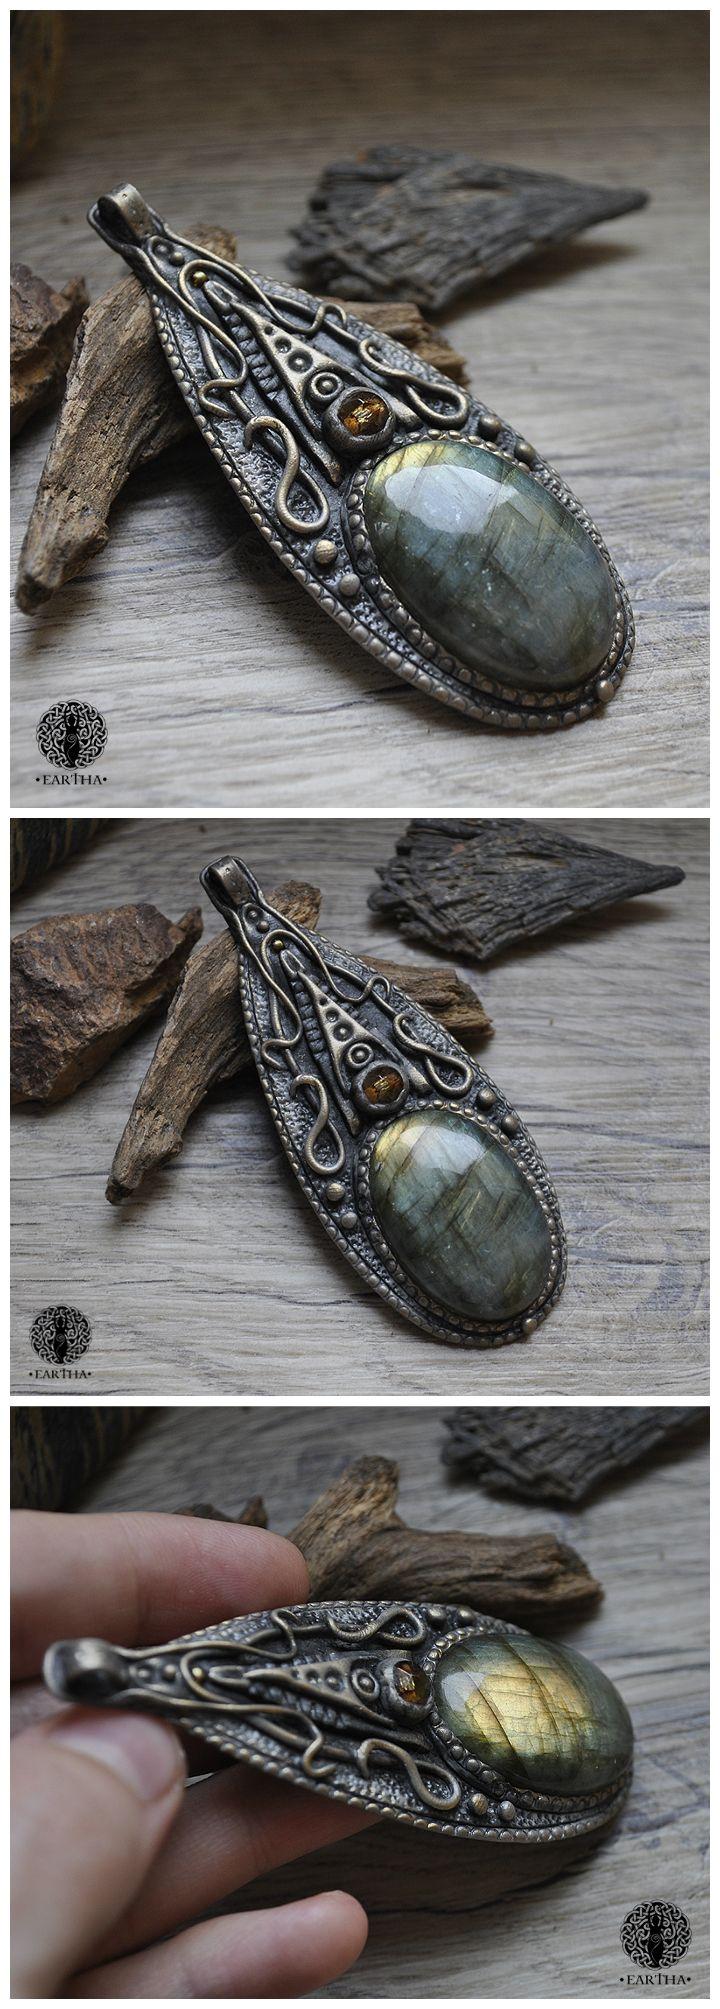 Eartha Creations handmade jewelry. Fantasy & unique design and stones! #jewelry #handmade #unique #fantasy #moon  #labradorite #spiritual #spirit #ooak #medieval #magical